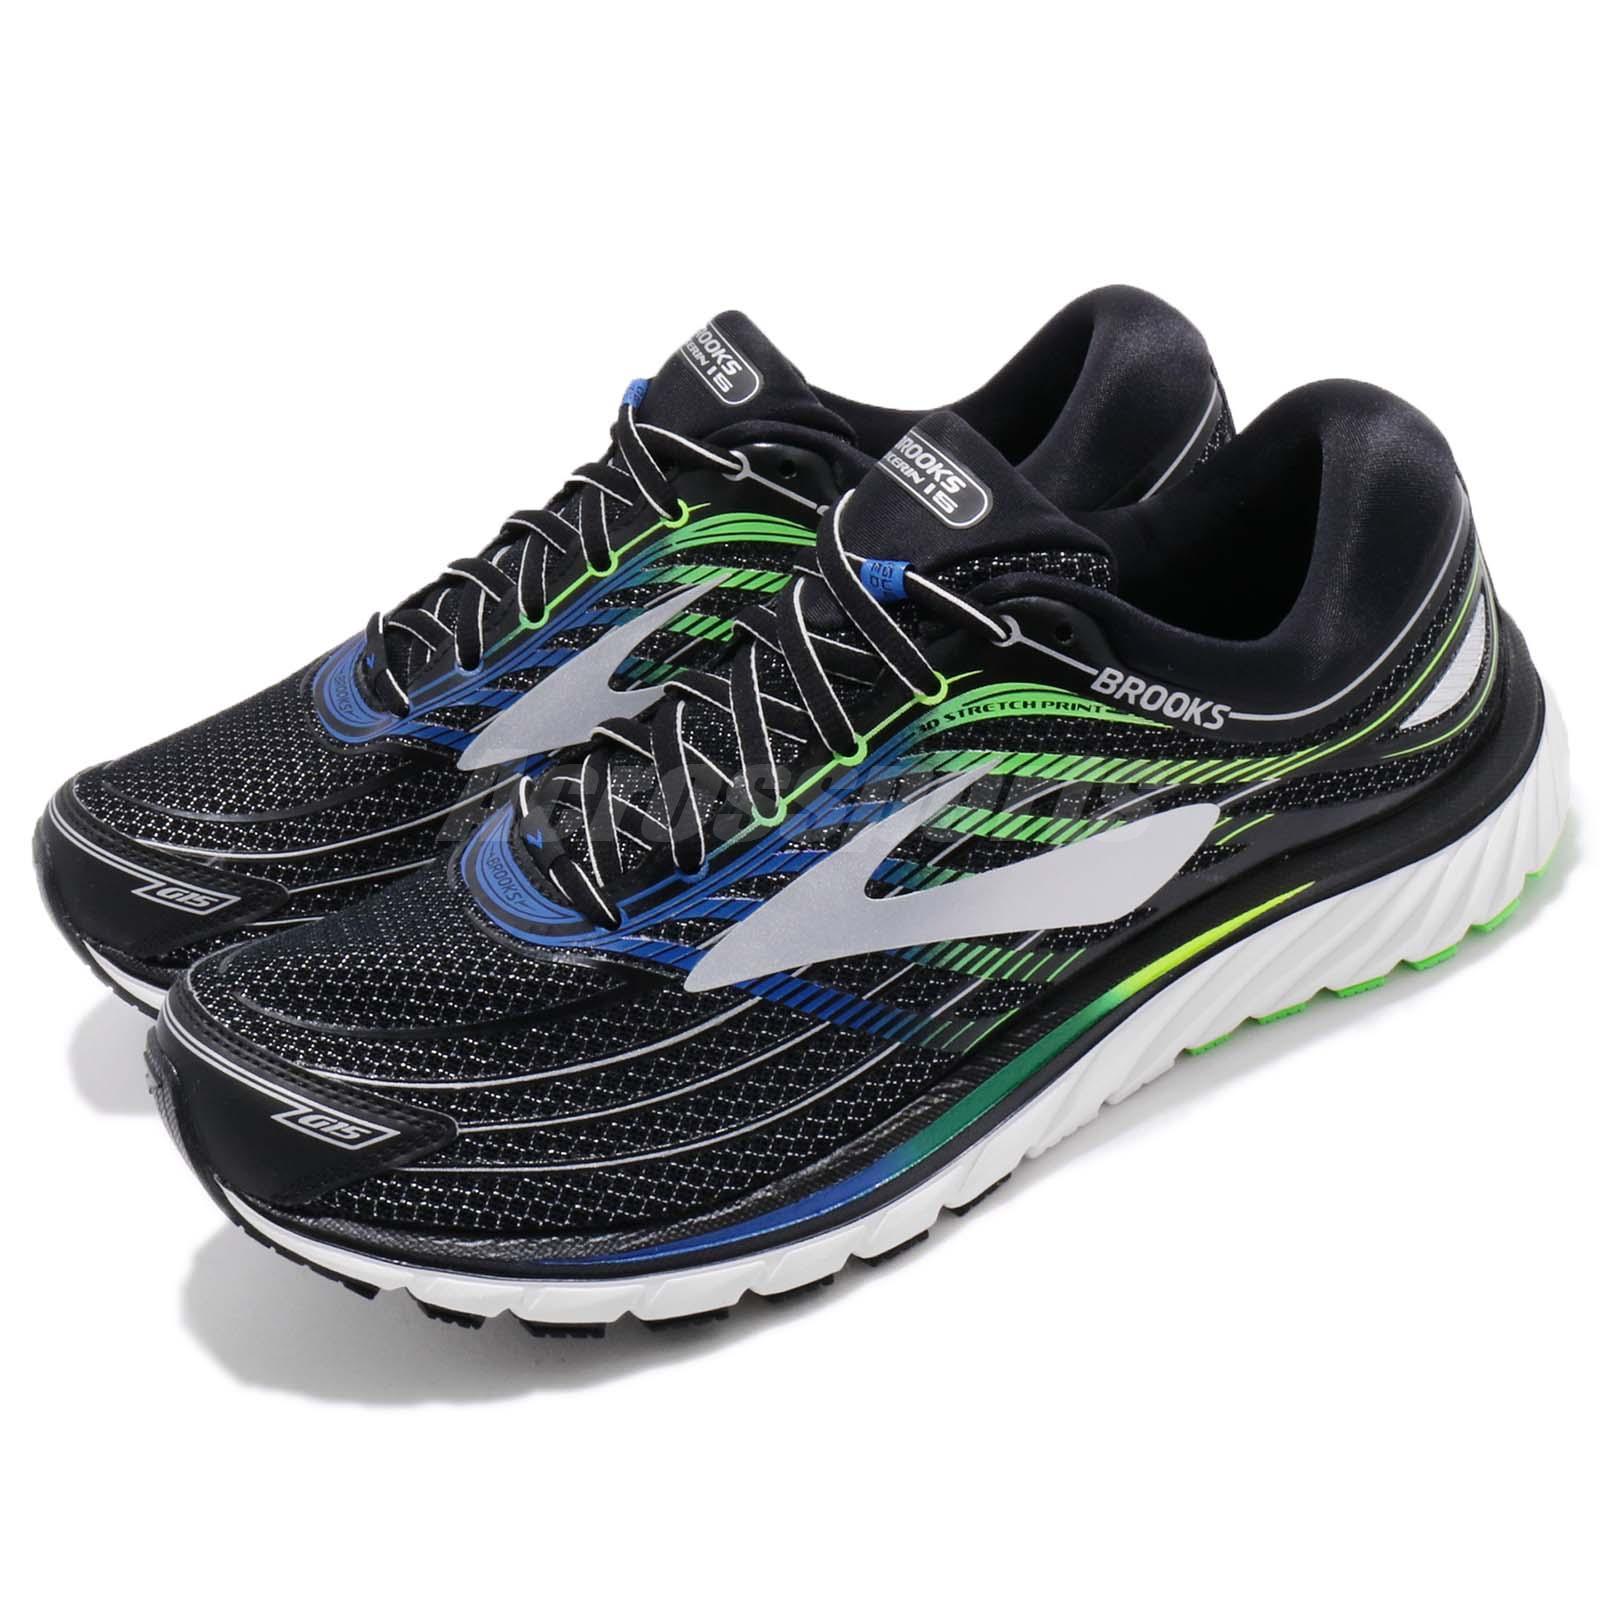 9c3240cd10ff2 Details about Brooks Glycerin 15 Desiree Linden 2E Wide Black Men Running  Sneaker 110258 2E